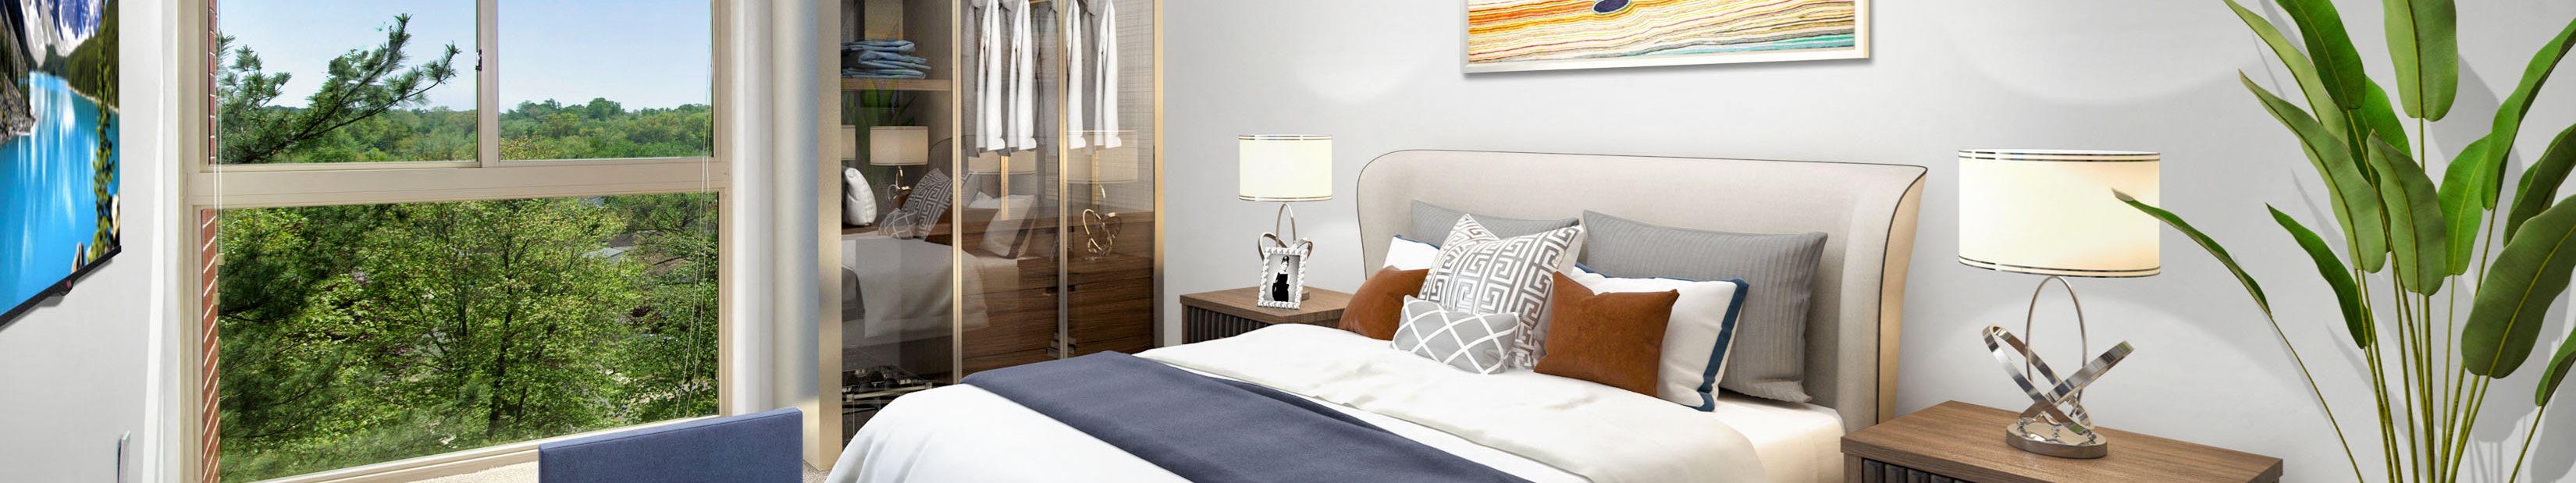 Horizon Square bedroom in Laurel, MD